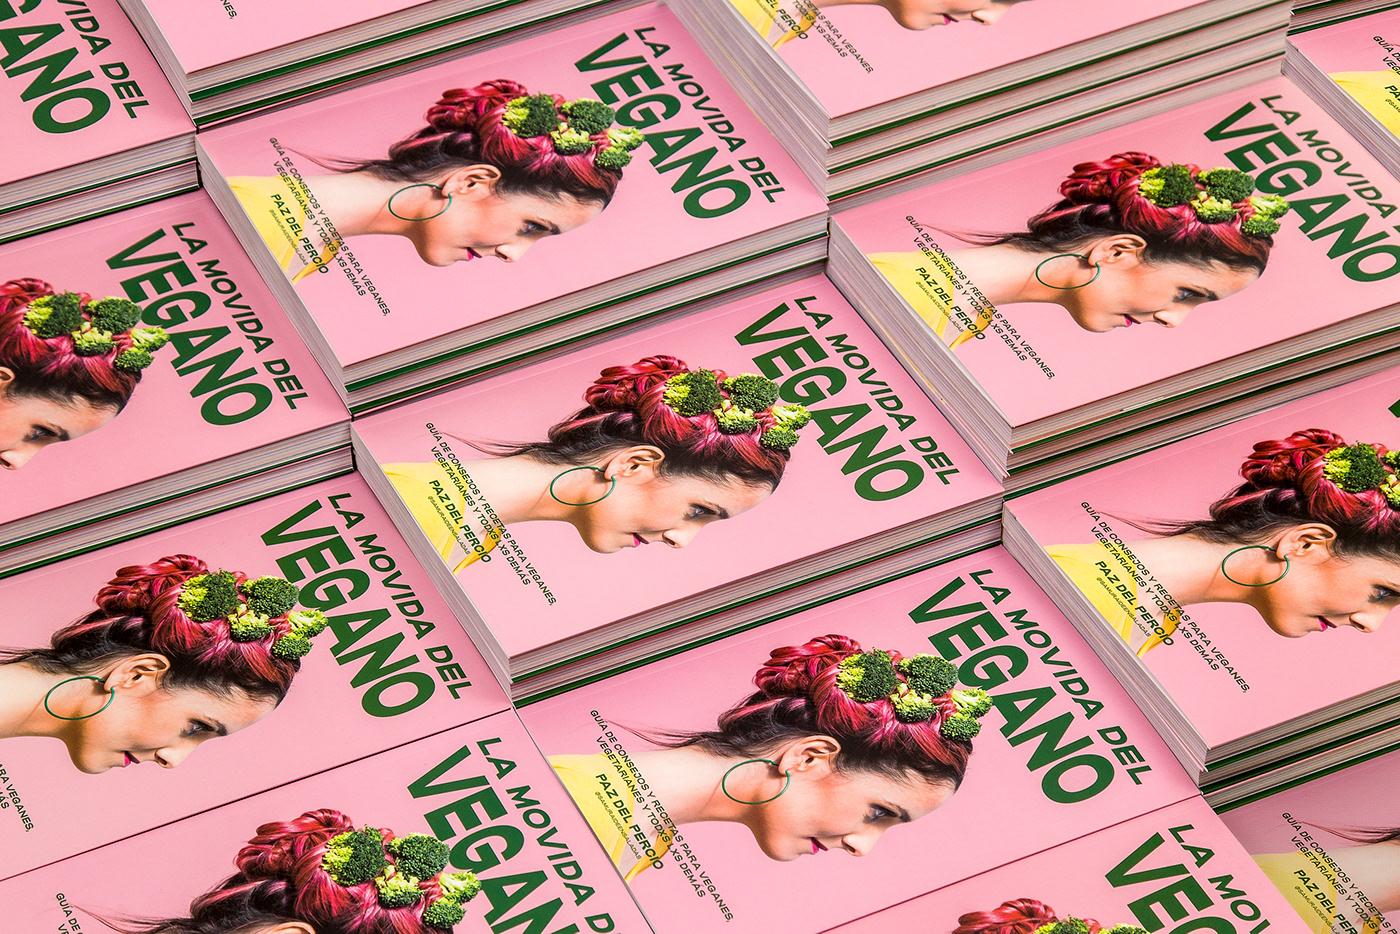 vegan colorful Food  book foodstyling asis argentina color spread veganism